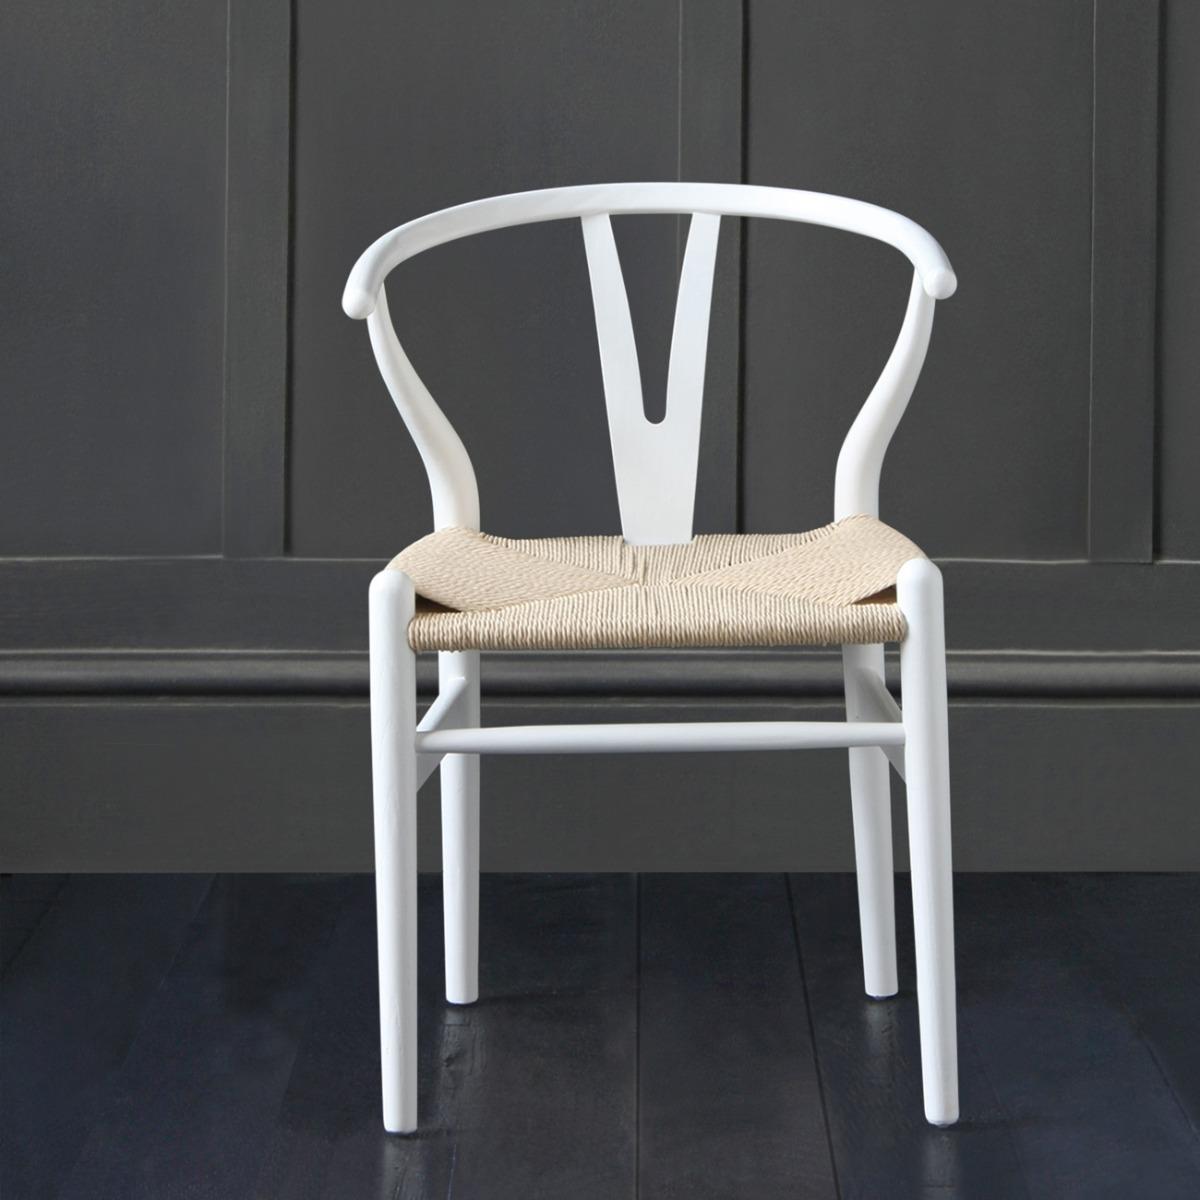 Hans Wegner Wishbone Chair, White Ash, Natural Coil Triple Weaved Seat